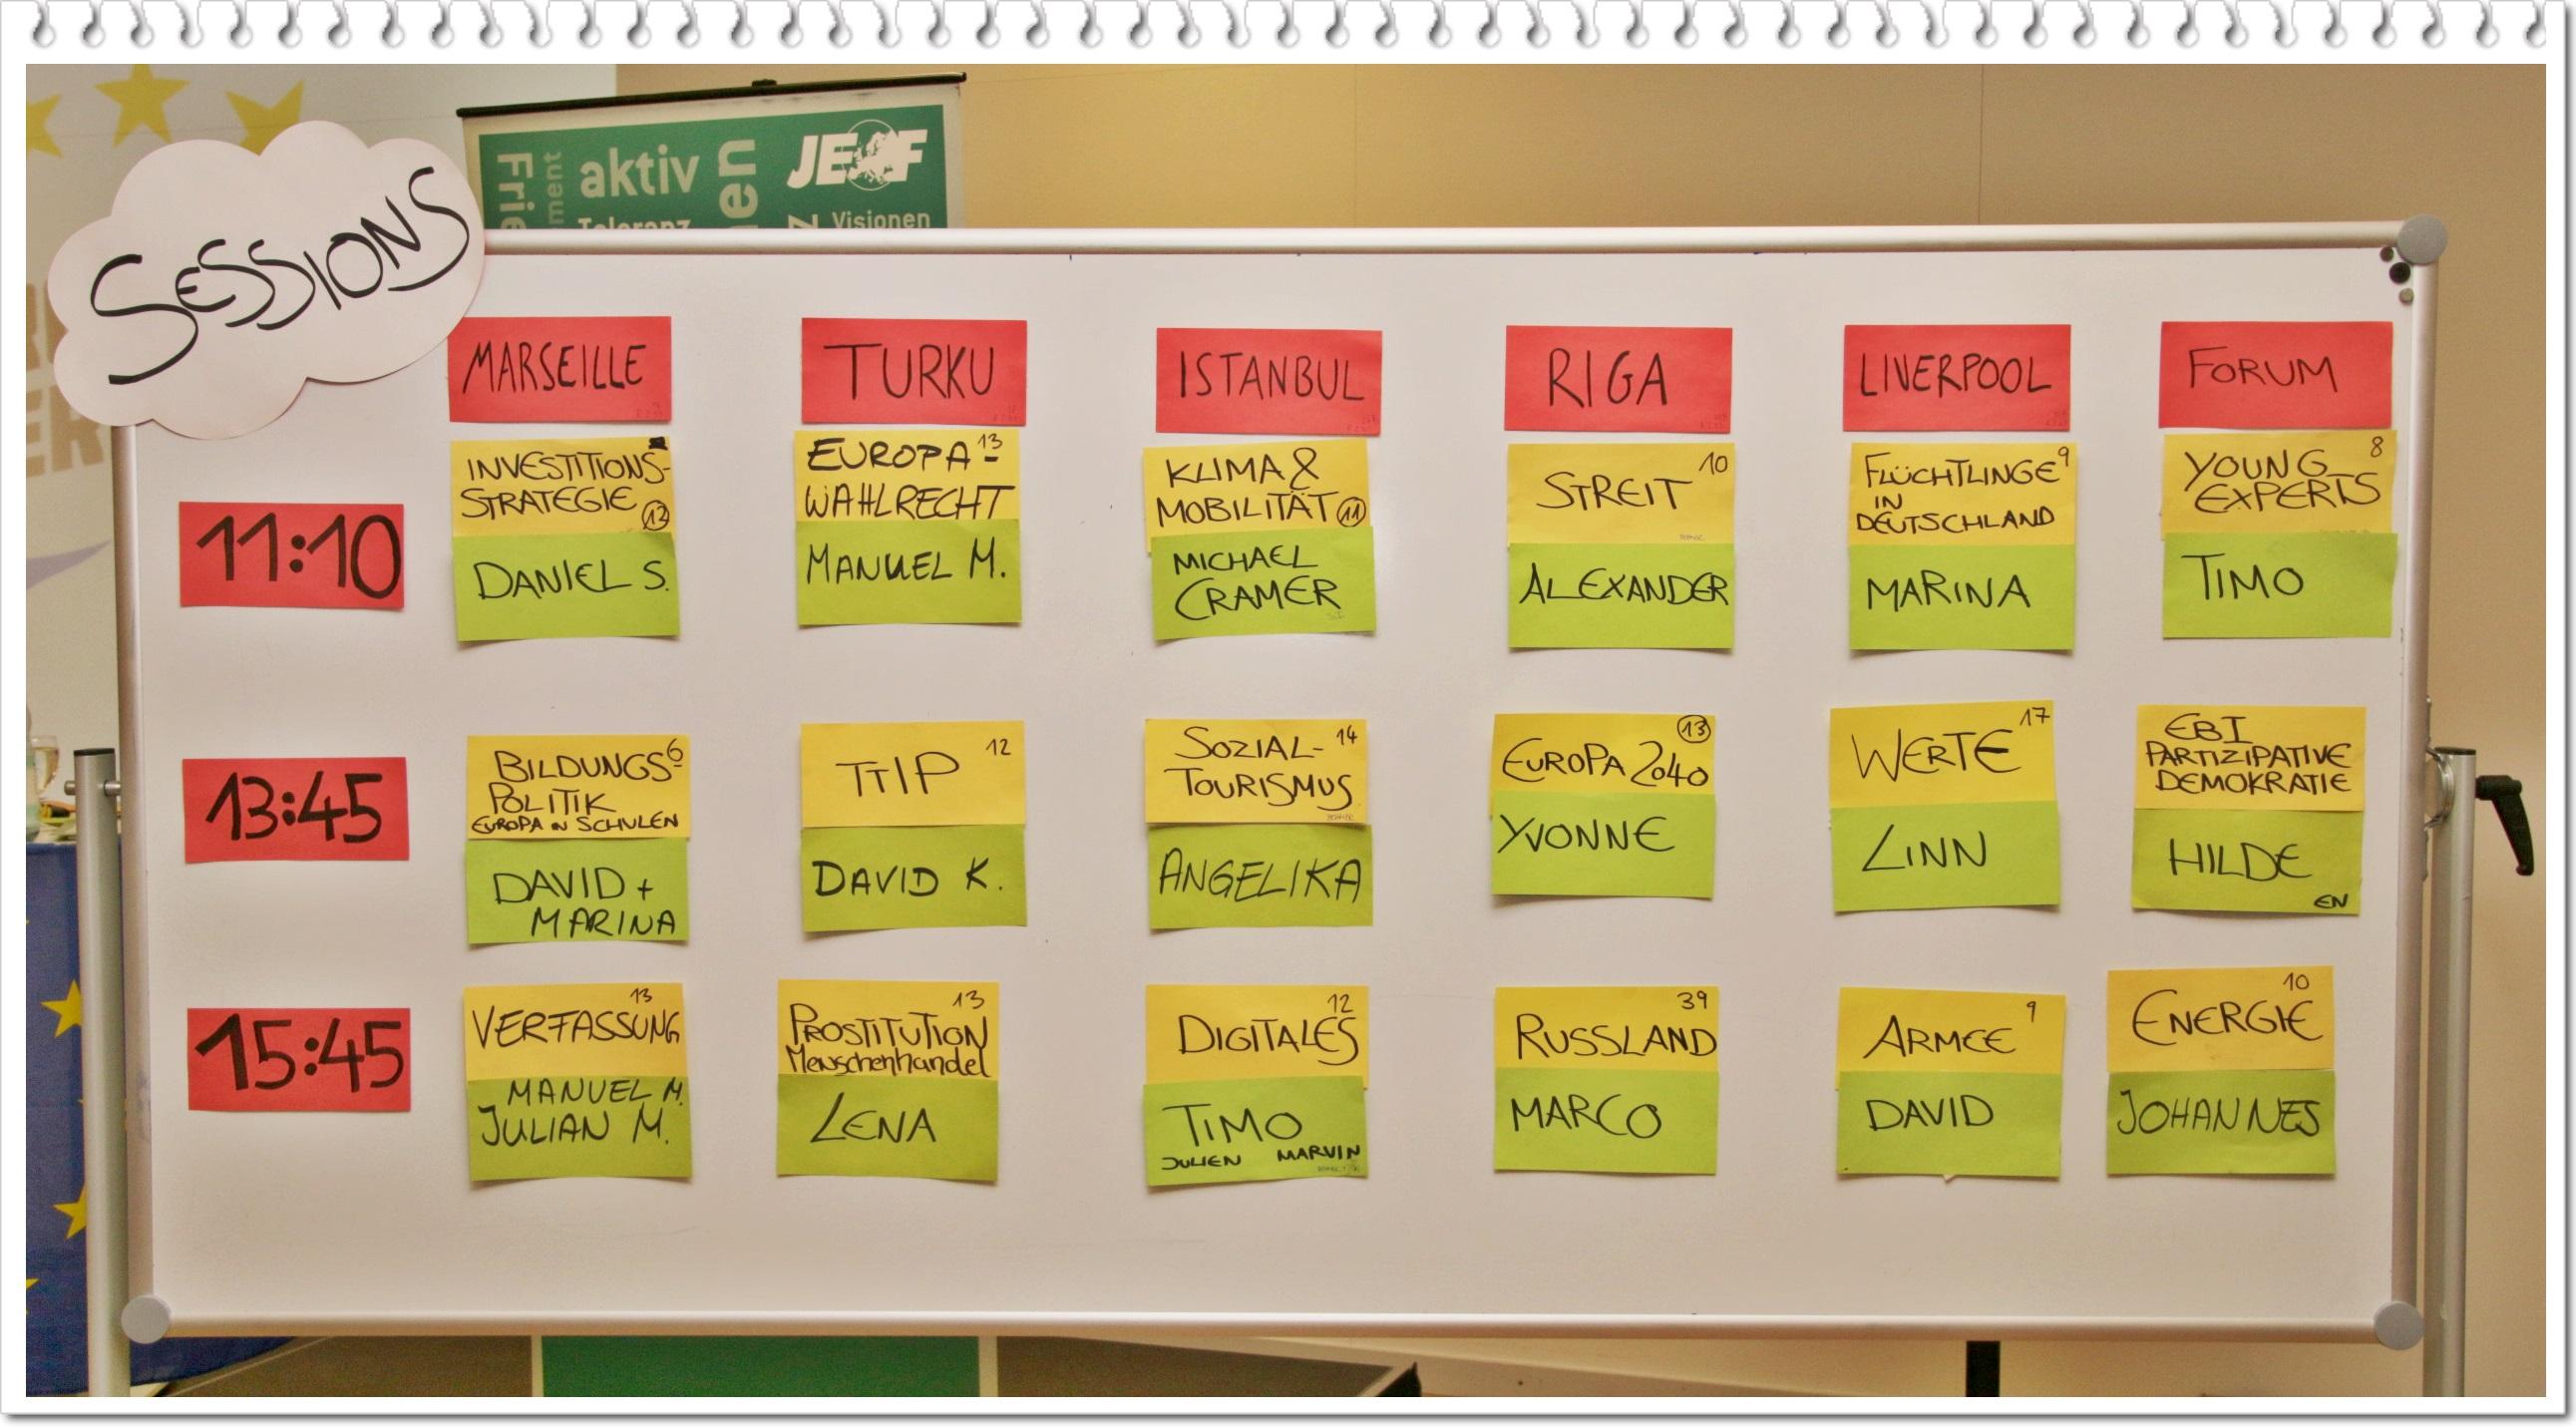 Sessionplan 2014